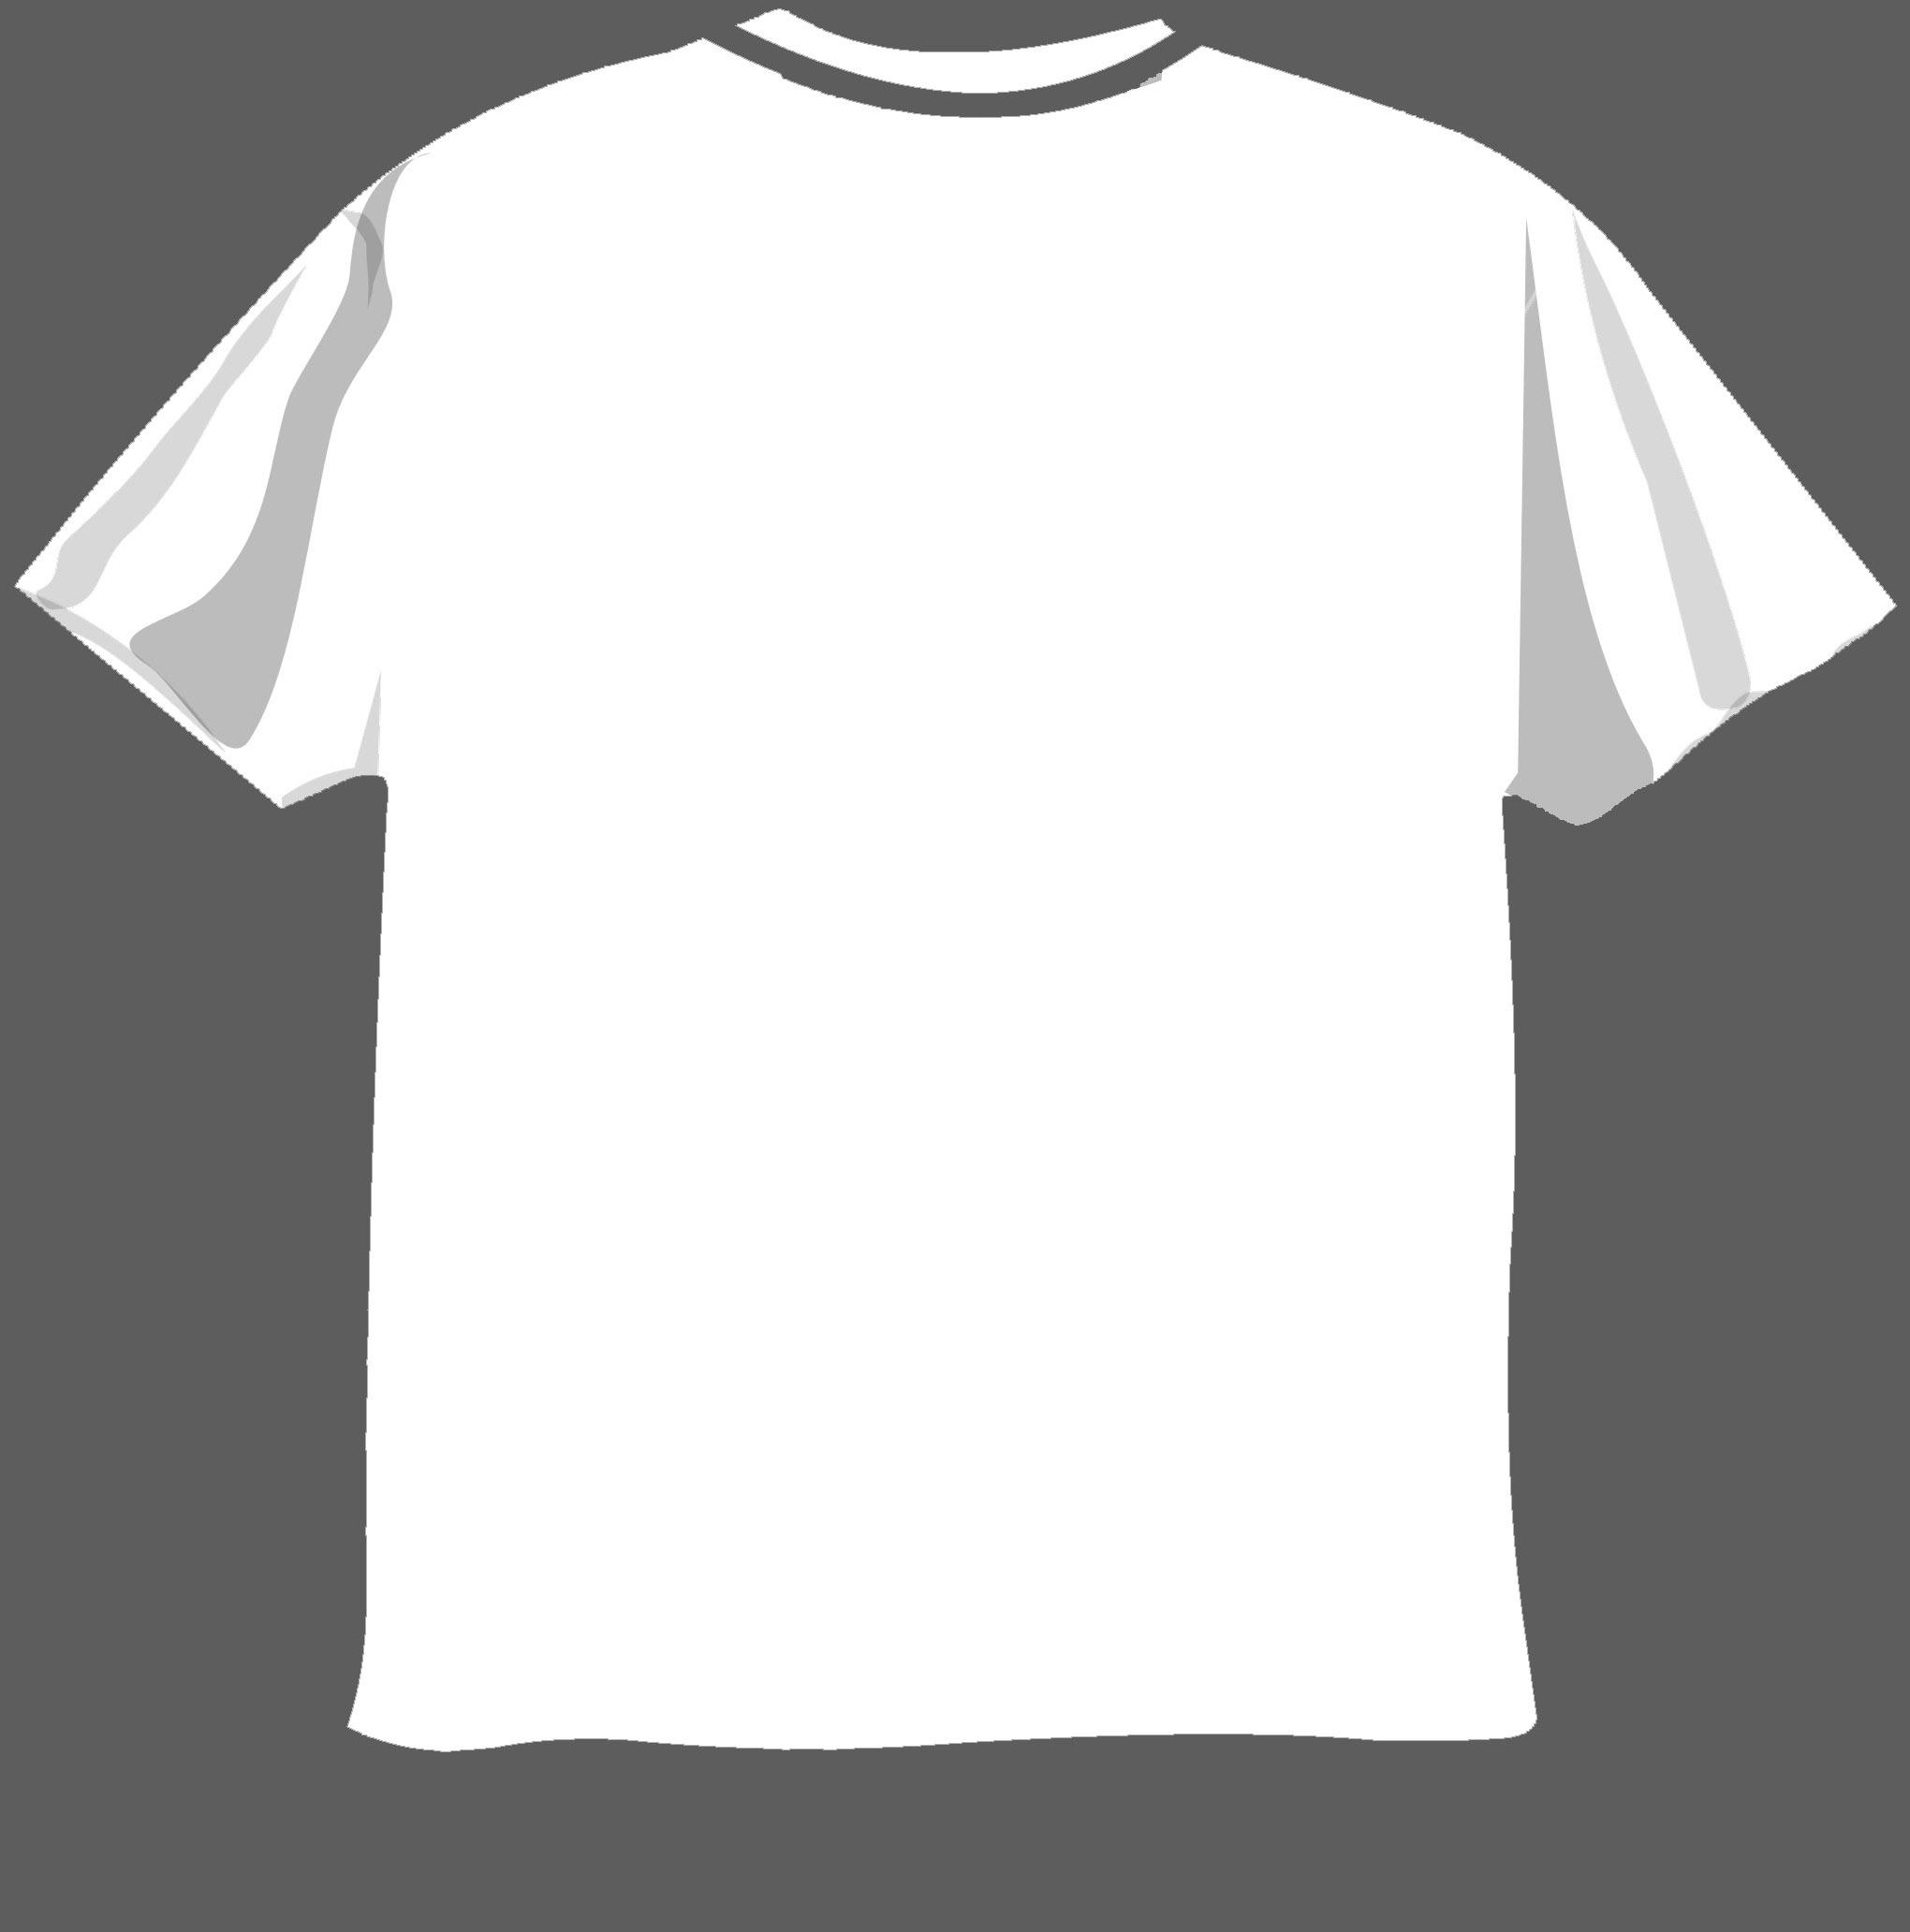 Shirt Design Template Photoshop